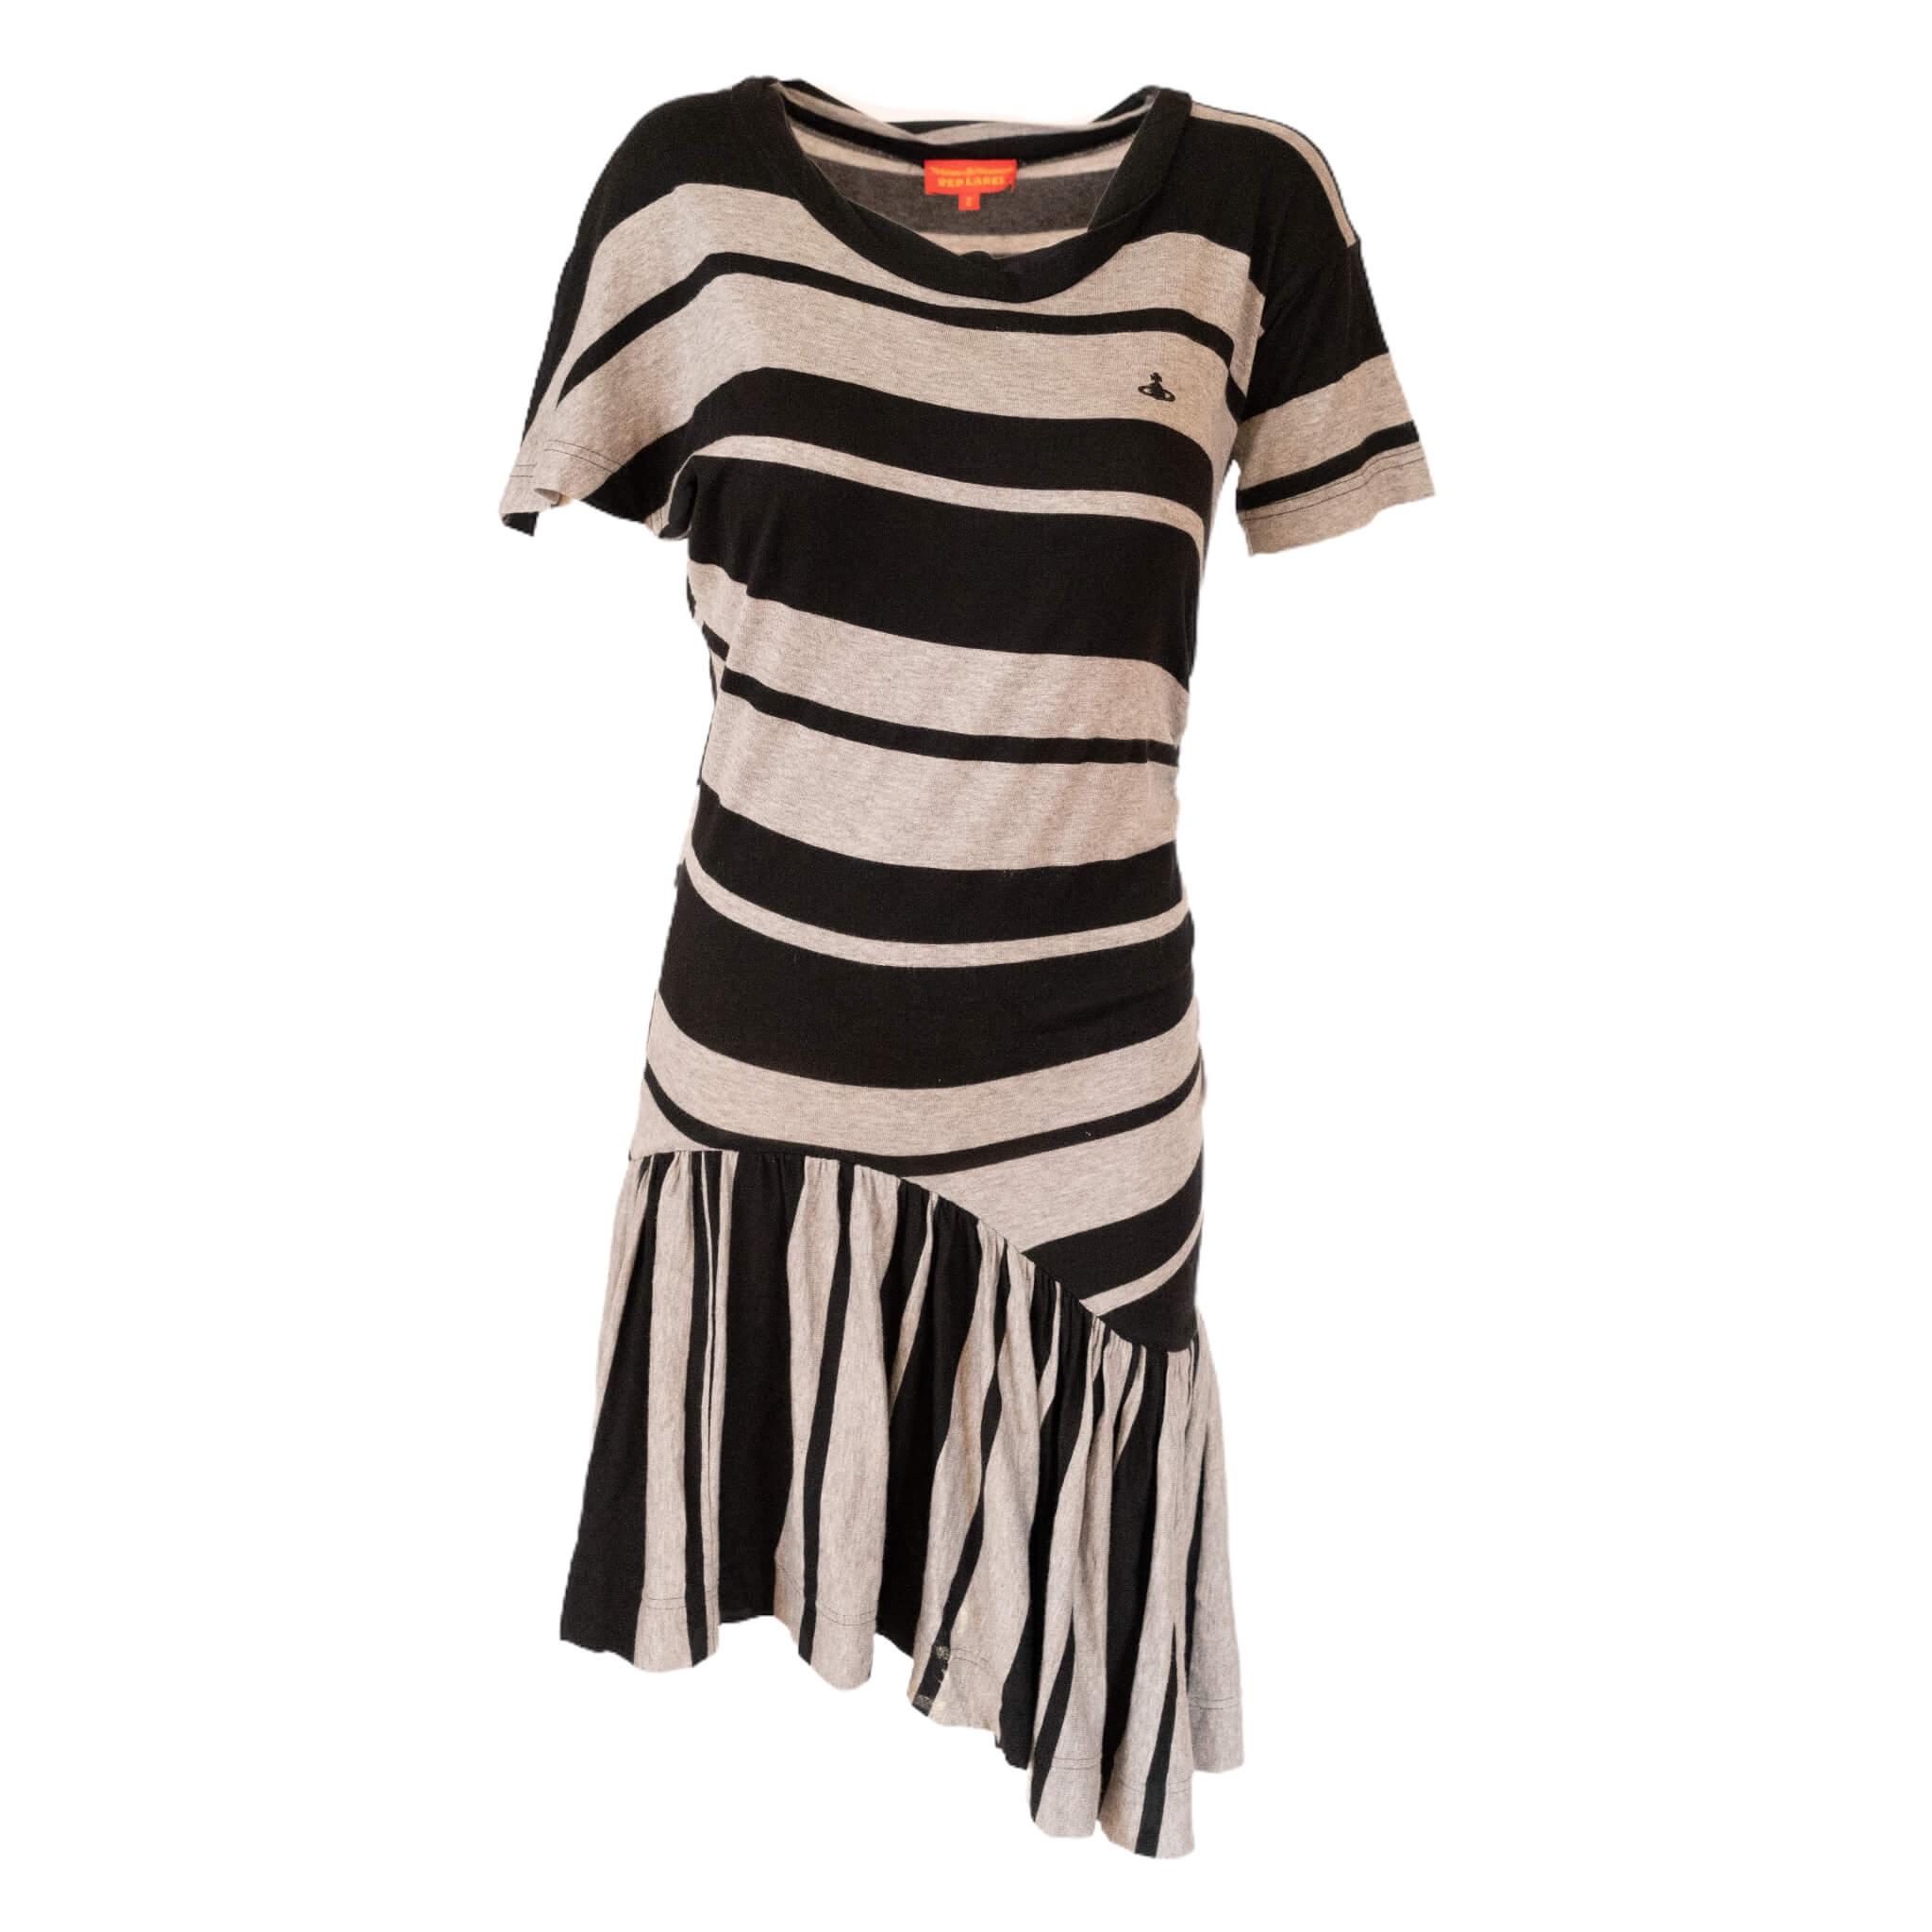 Vivenne Westwood Endless Flirt Dress